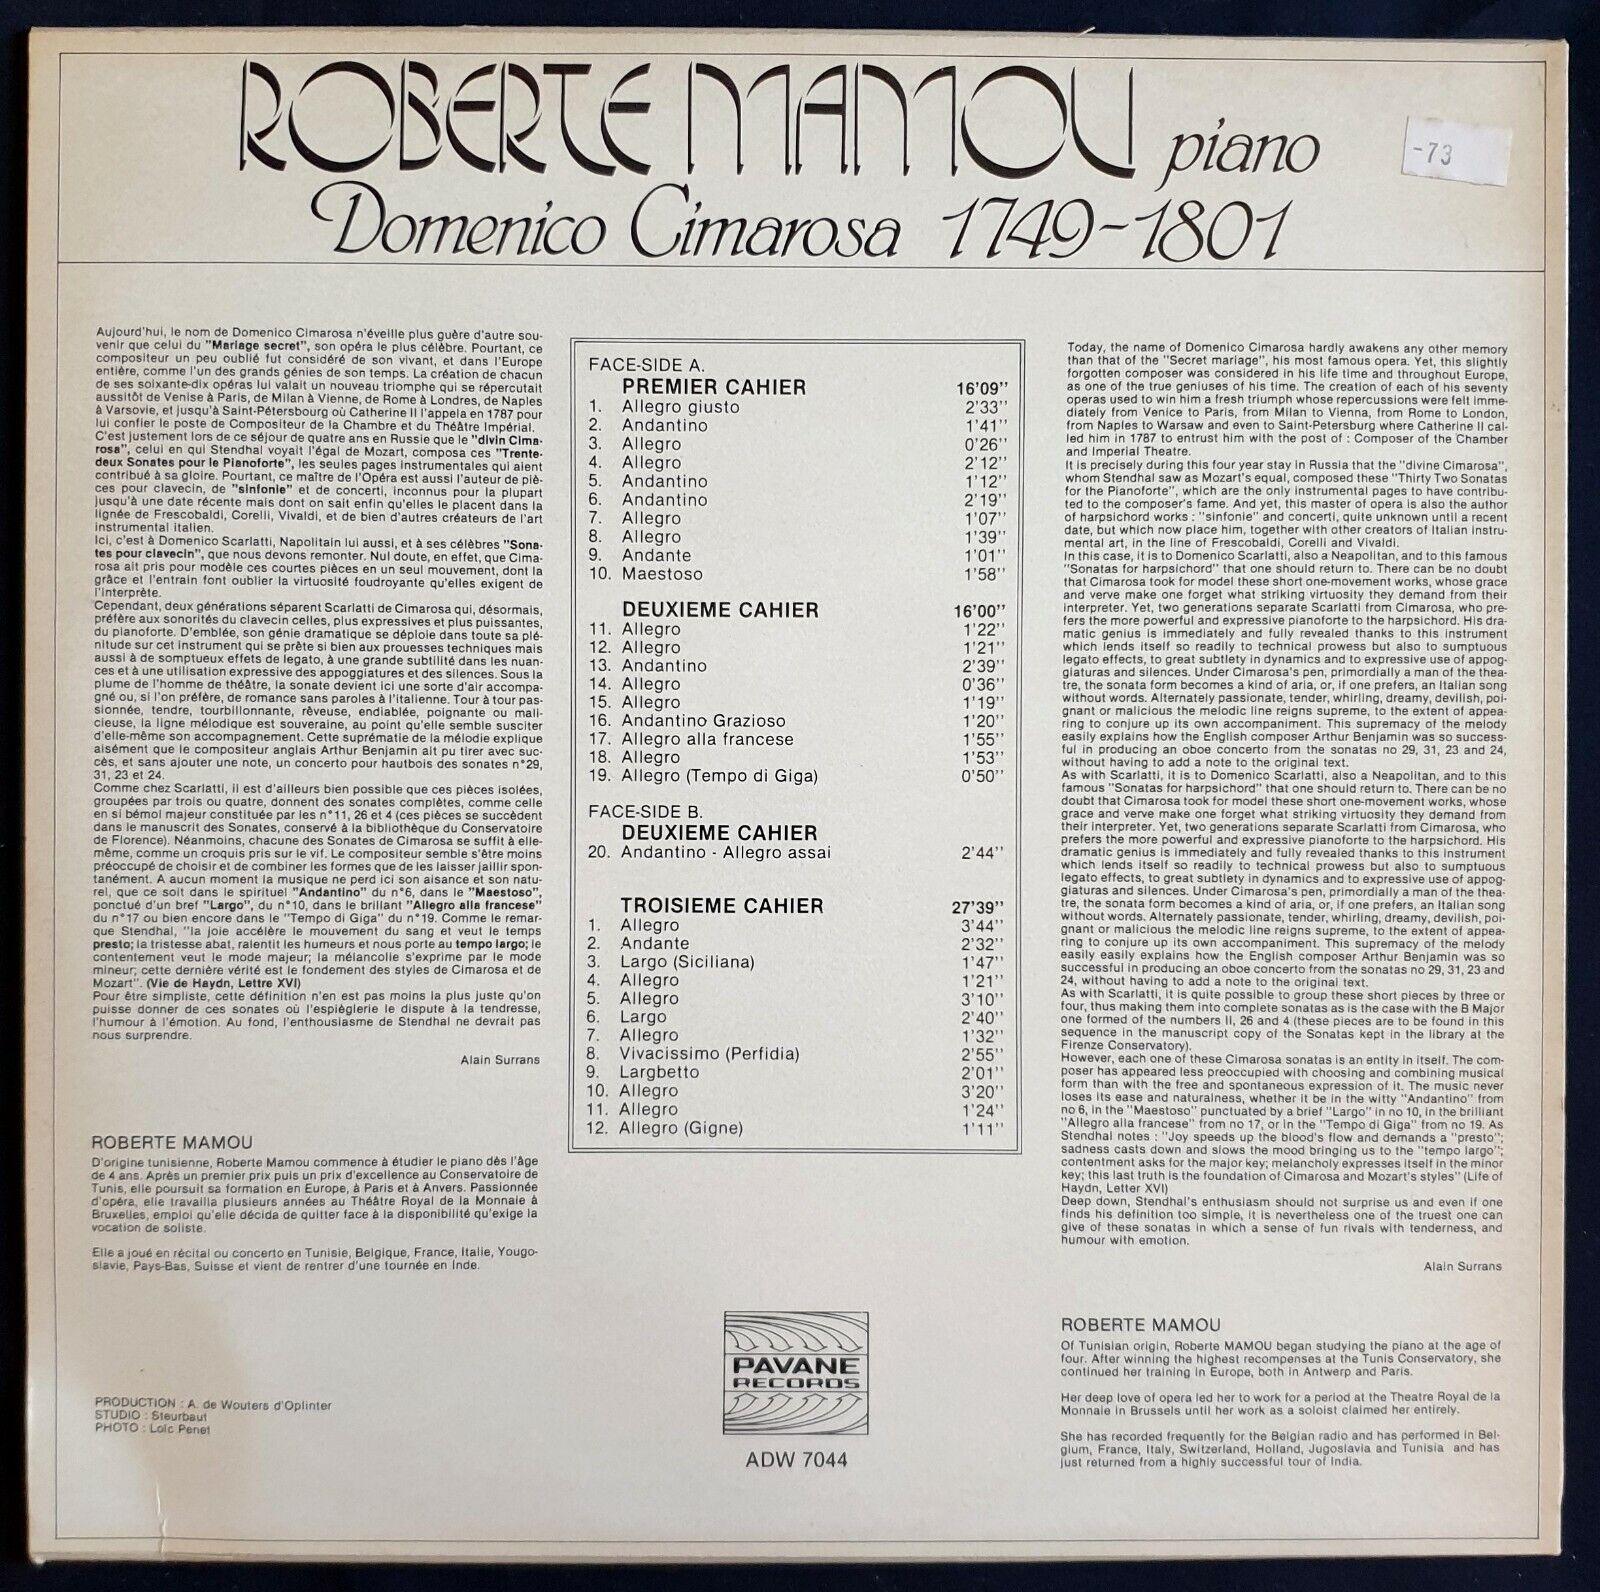 Photo 2 - PAVANE vinile LP domenico cimarosa, ROBERTE MAMOU